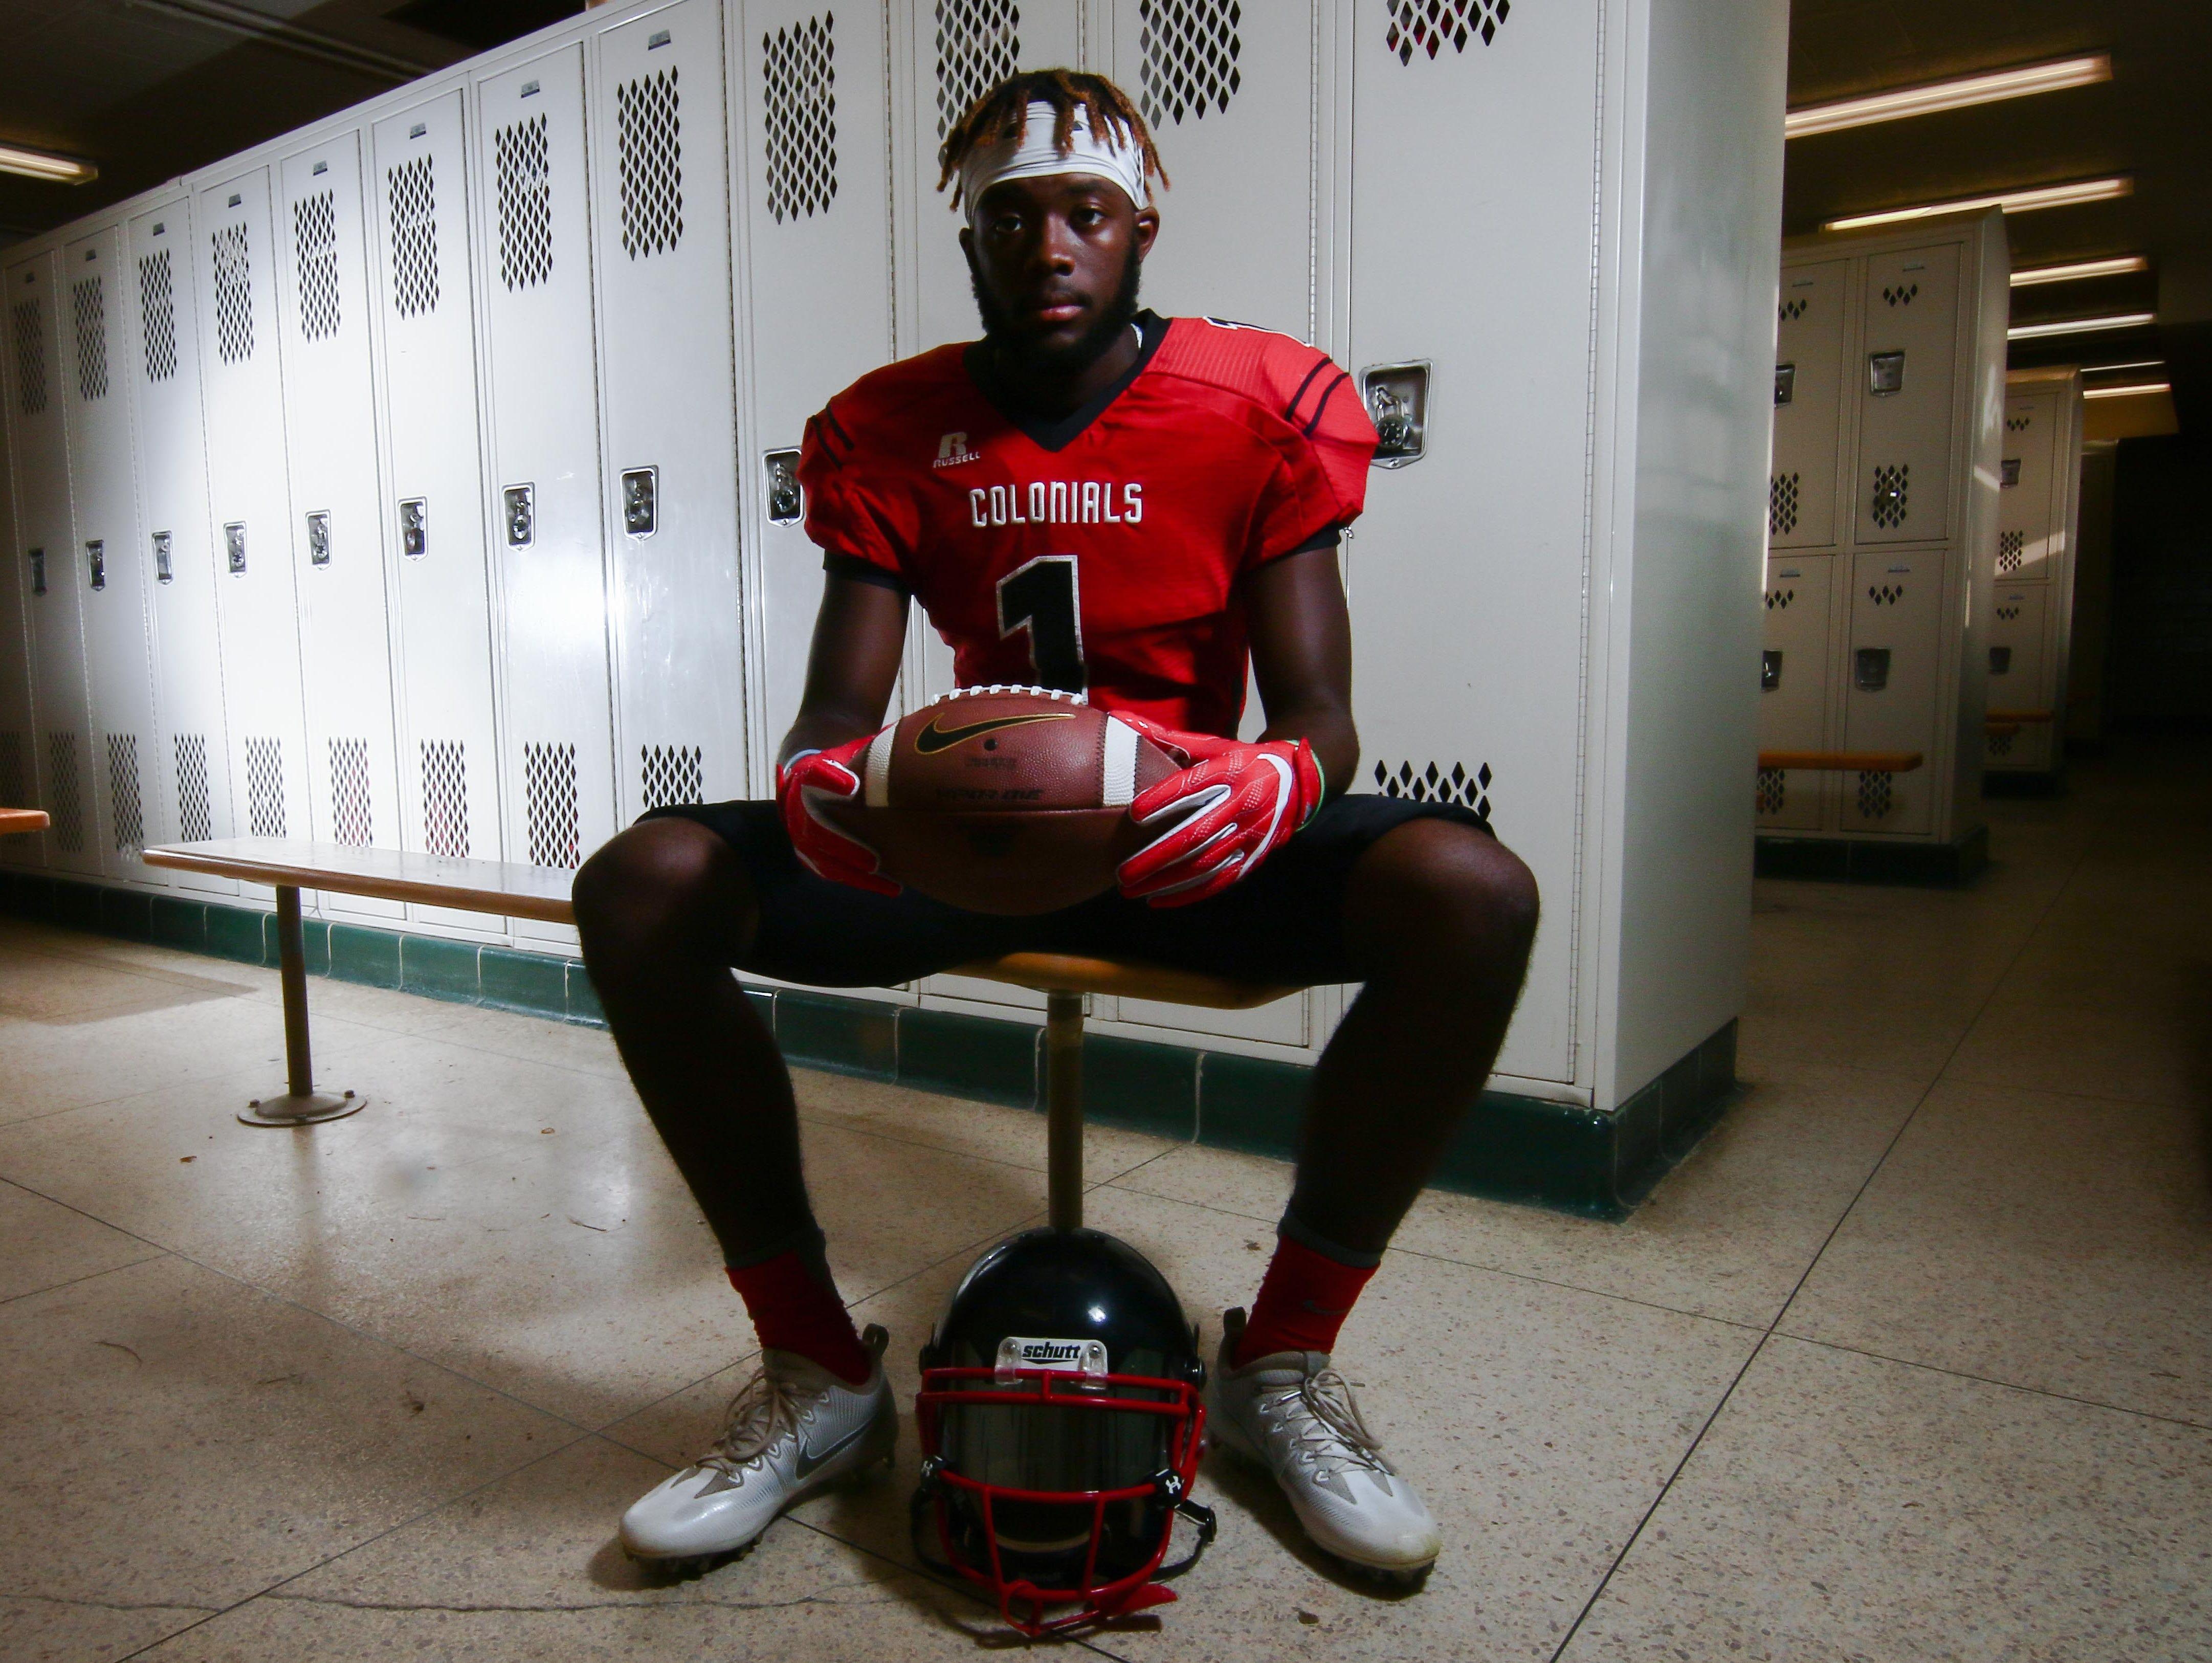 William Penn quarterback Zach Burton (1) pose for a photo during for a preseason feature shoot Thursday, August. 25, 2016, at Willian Penn High School in New Castle.